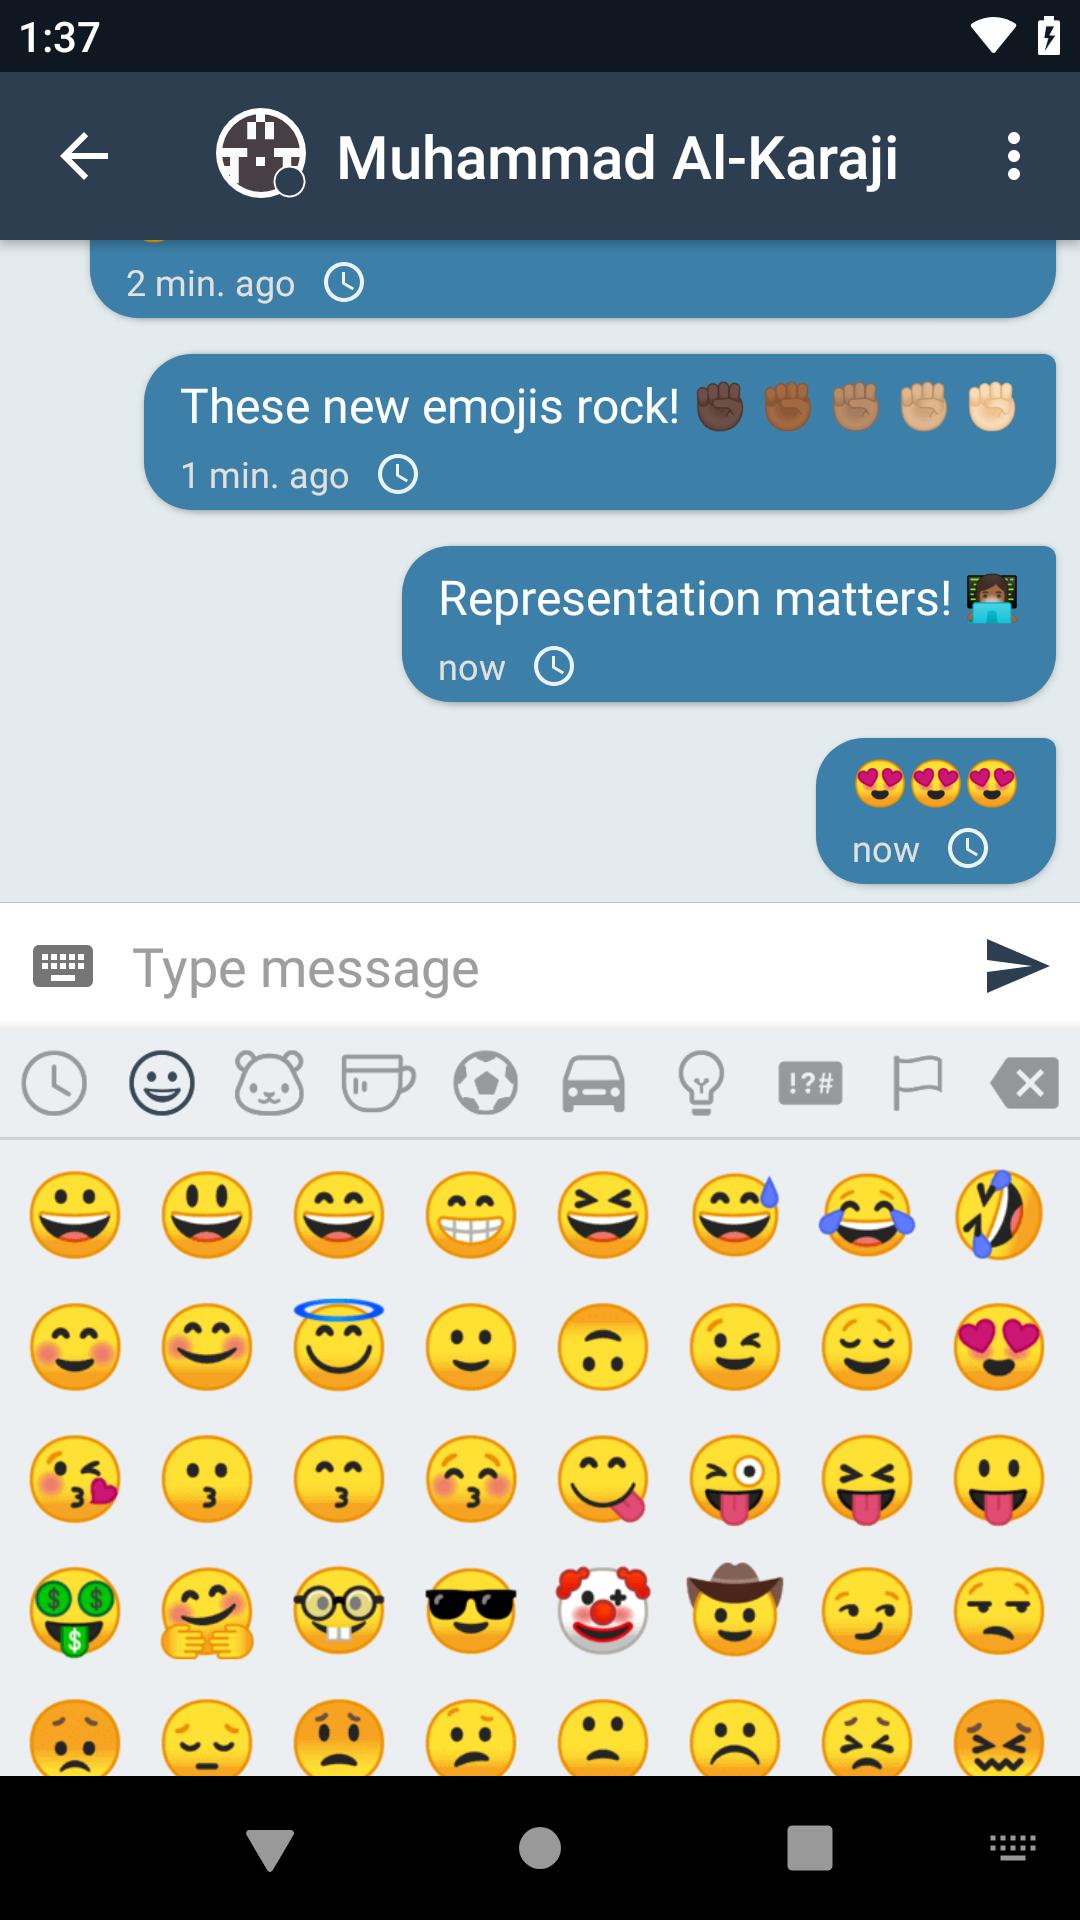 img/screenshots/11_emoji_light.png